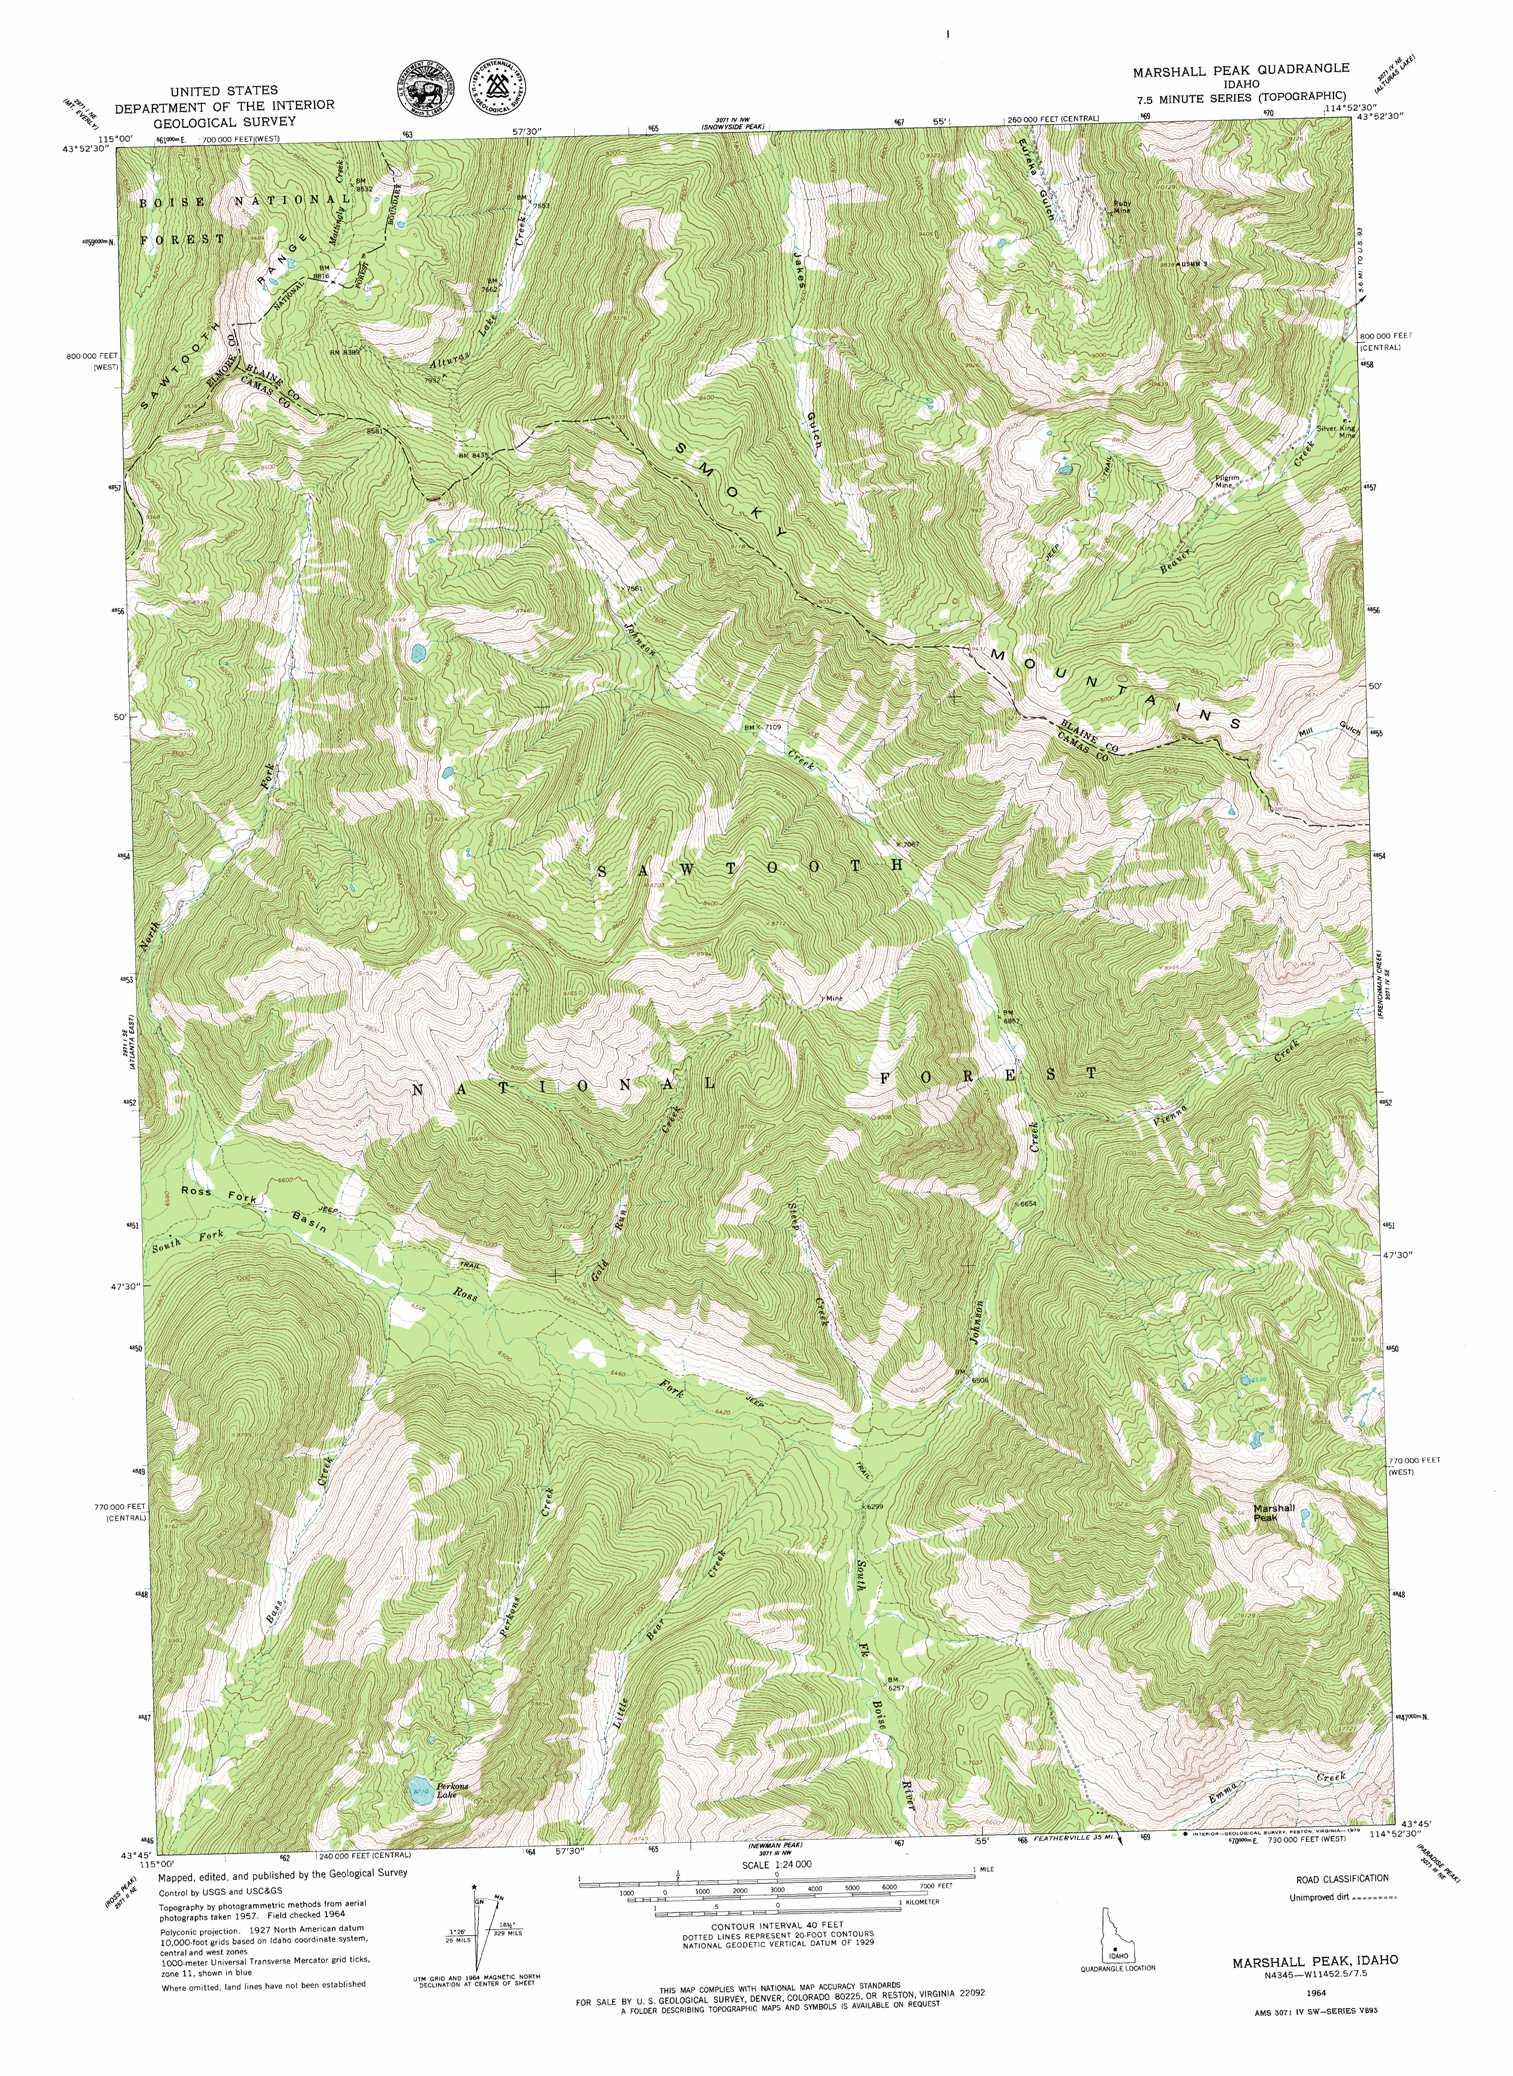 Marshall Peak topographic map, ID - USGS Topo Quad 43114g8